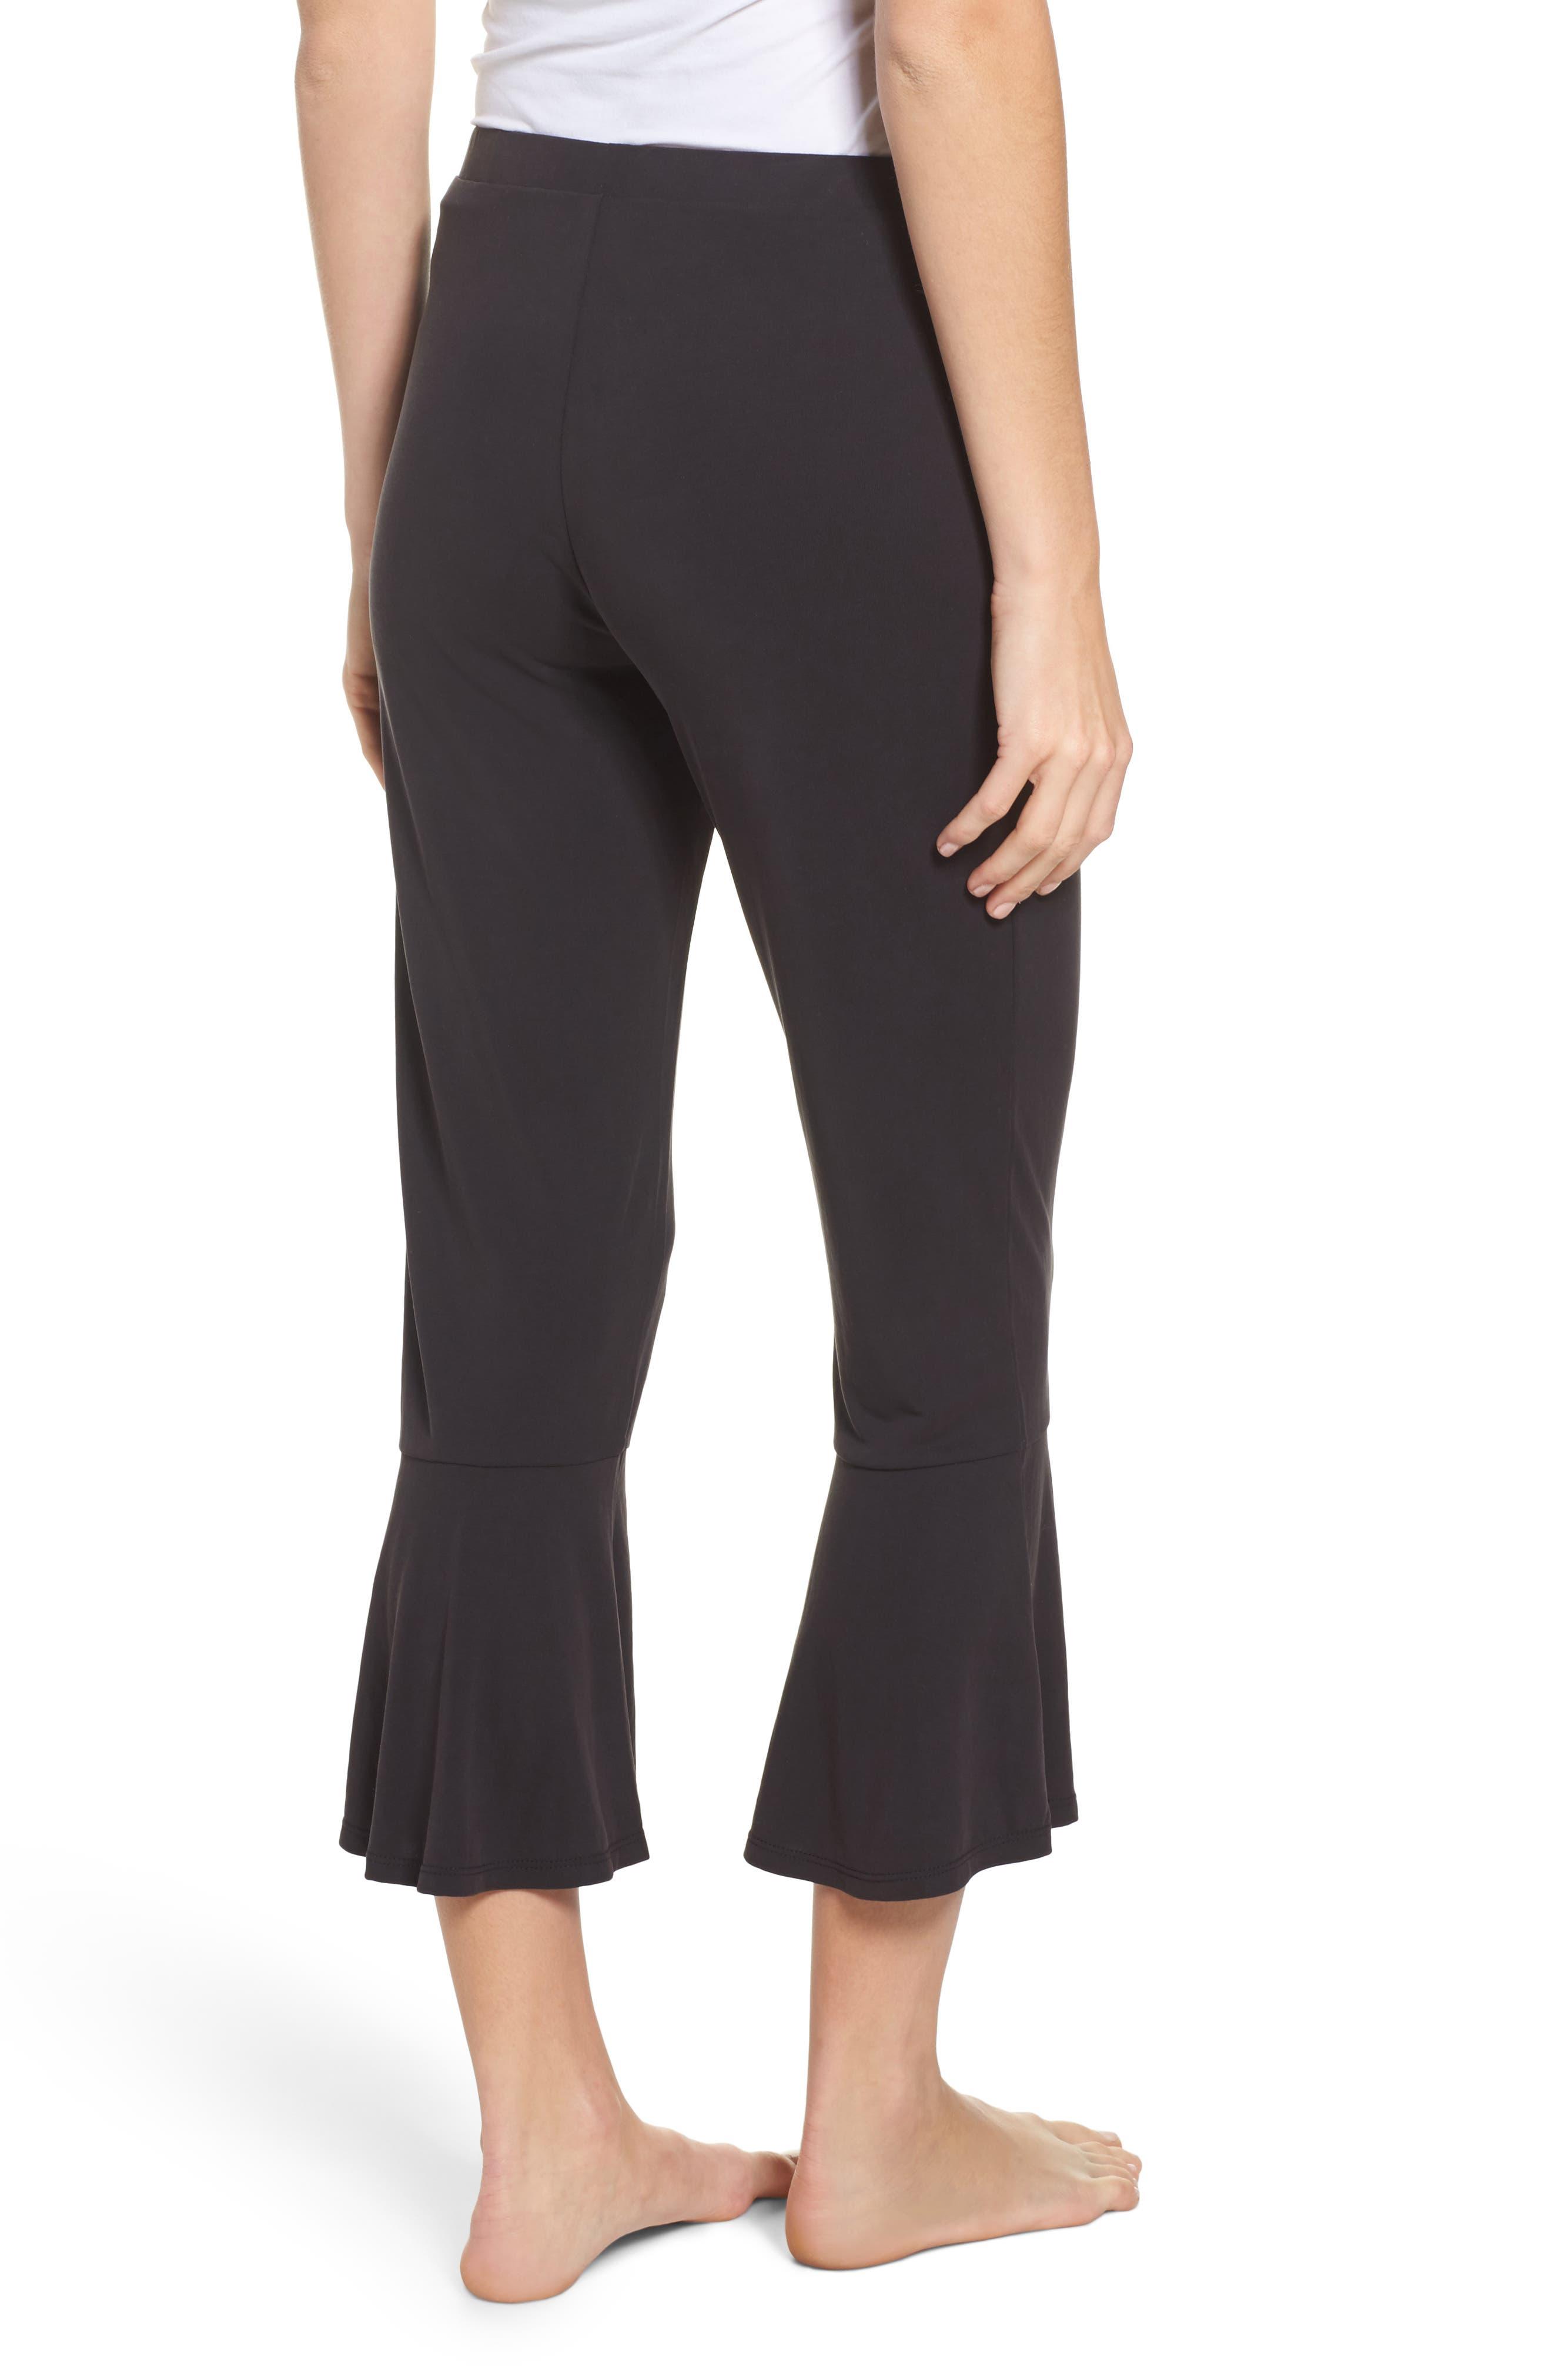 Aden Ruffle Hem Lounge Pants,                             Alternate thumbnail 2, color,                             BLACK